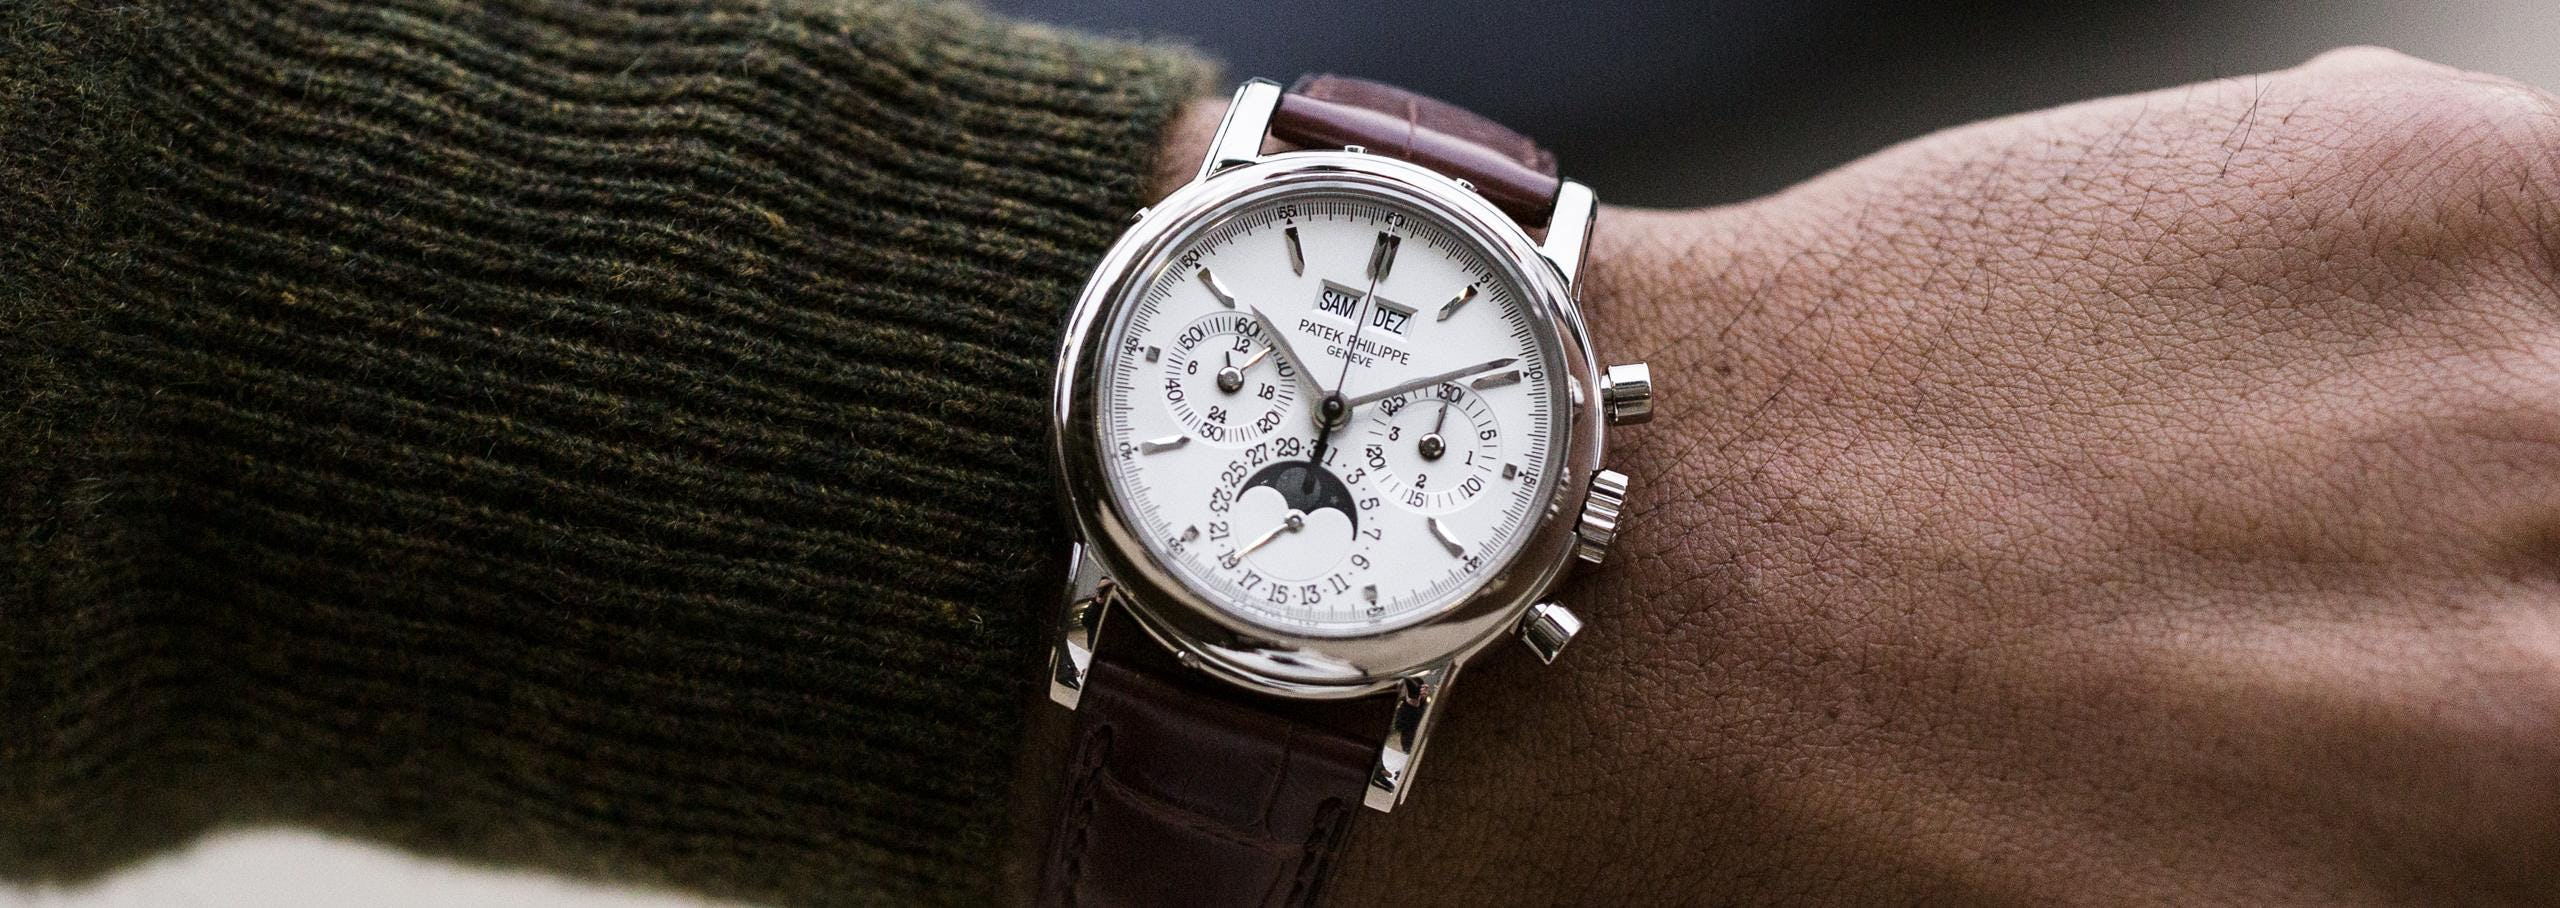 Perpetual vs. Annual Calendar Watches